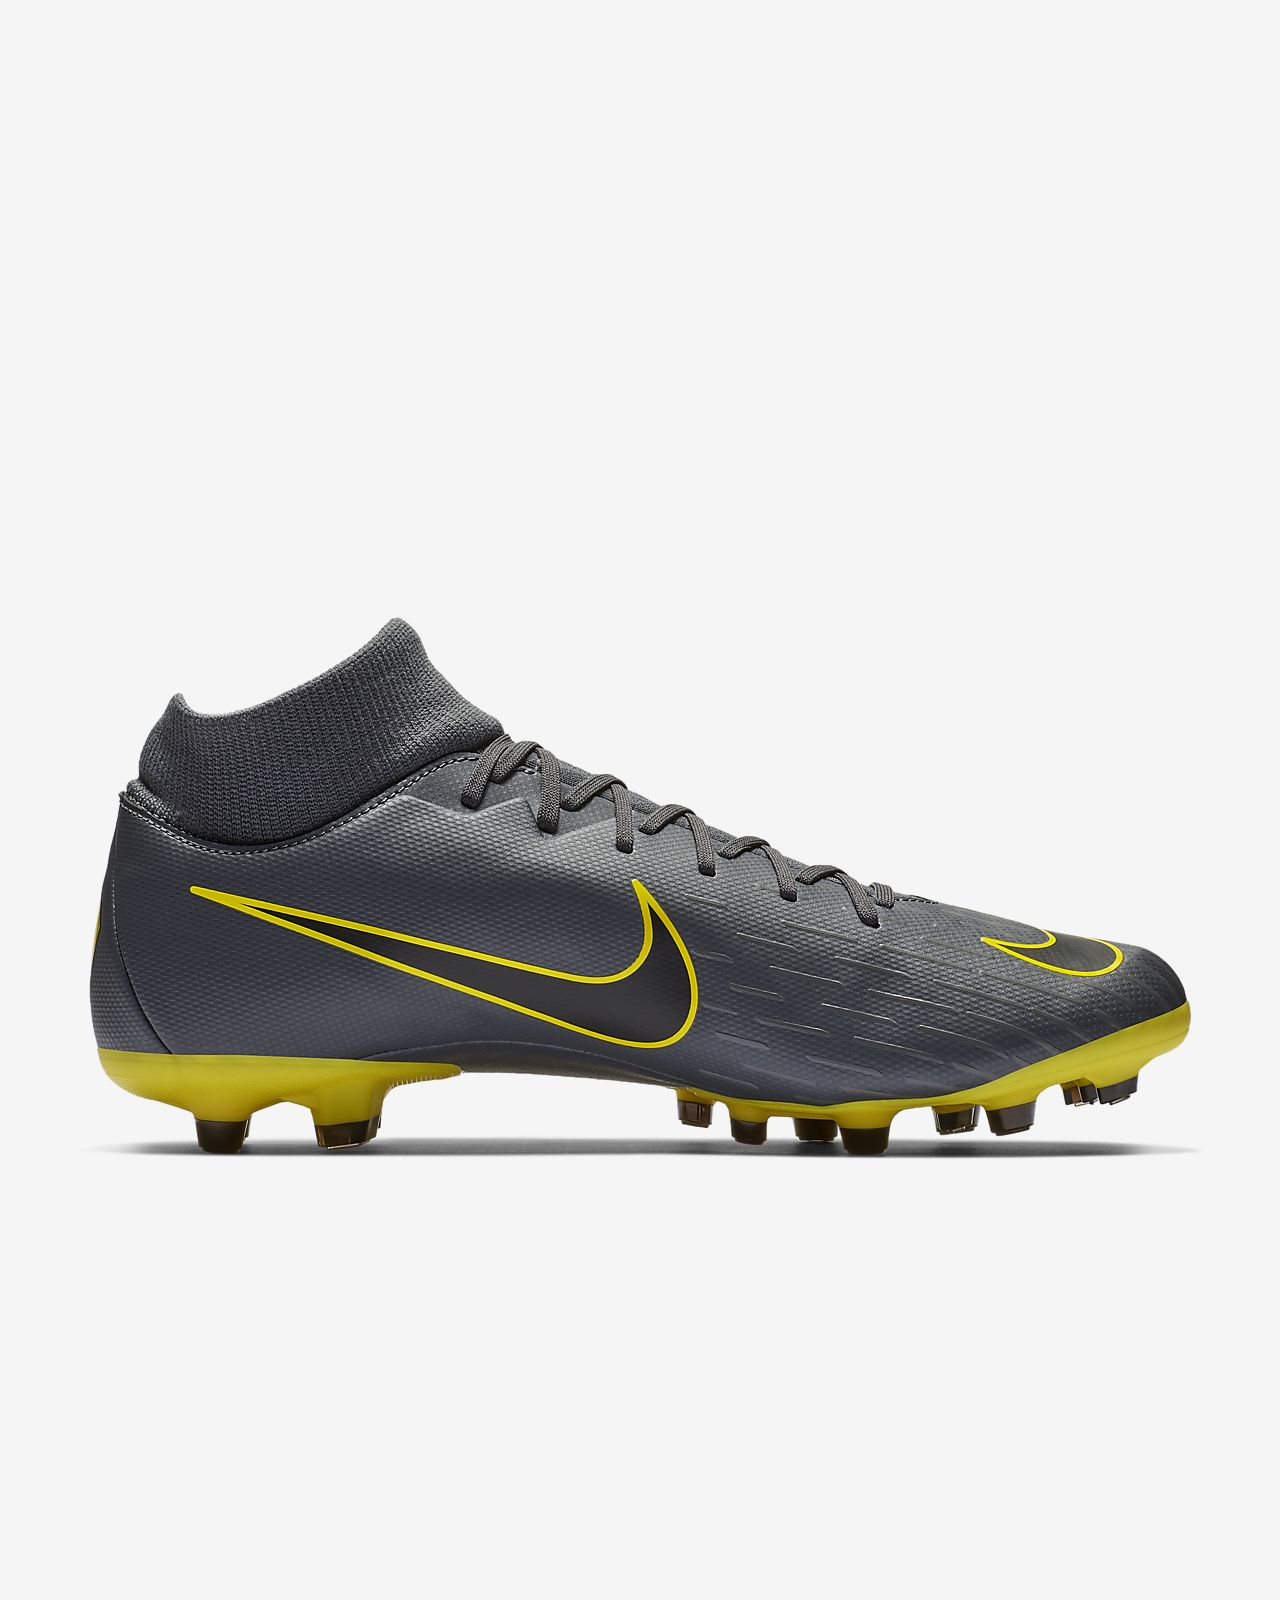 7f54bd90722 ... Calzado de fútbol para múltiples superficies Nike Mercurial Superfly 6  Academy MG